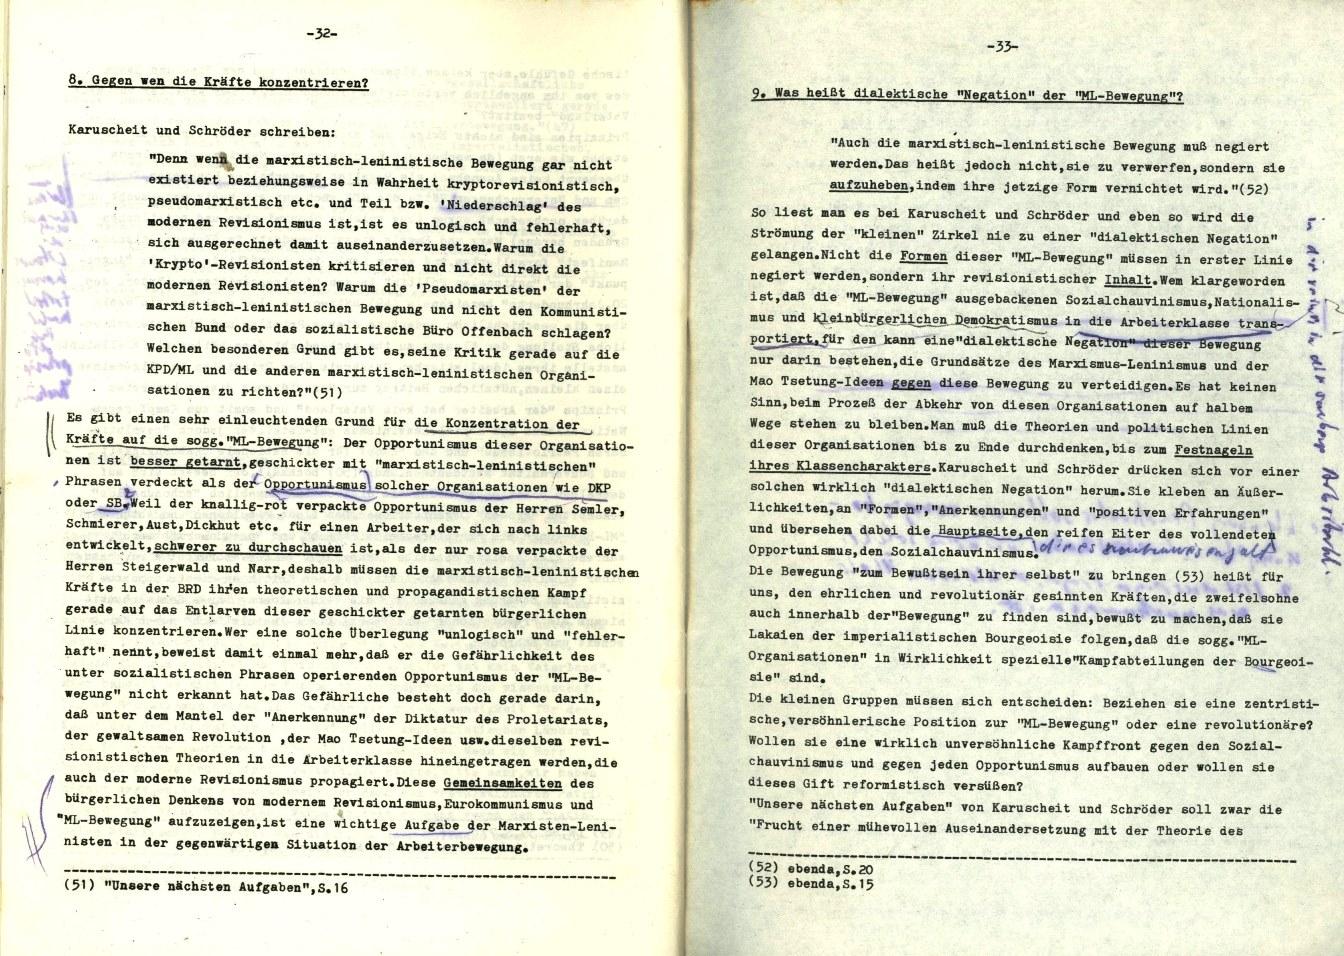 Muenchen_Kampf_dem_Revisionismus_1978_07_17